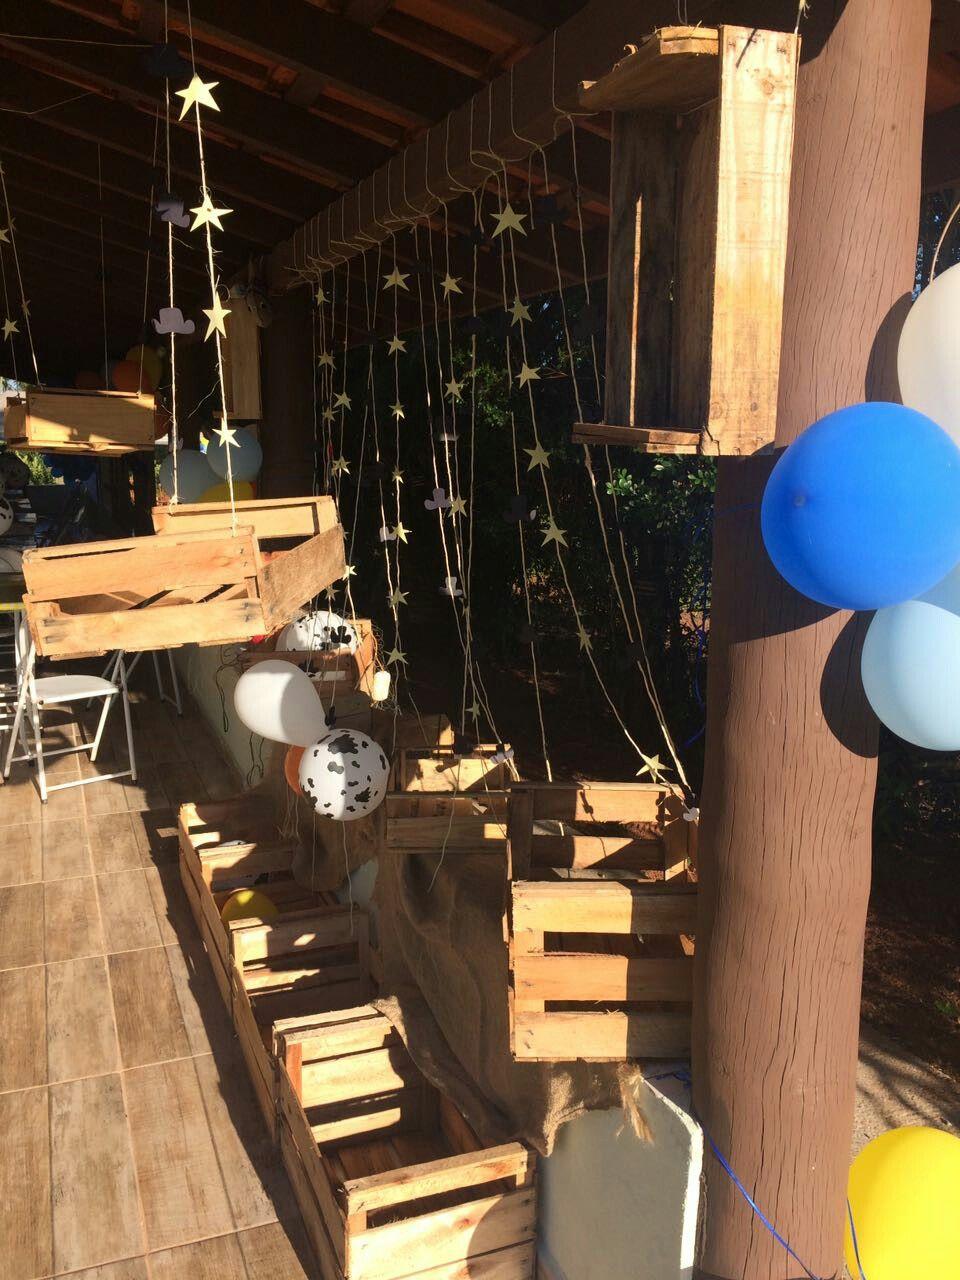 Caixas de madeira aguardando os presentes